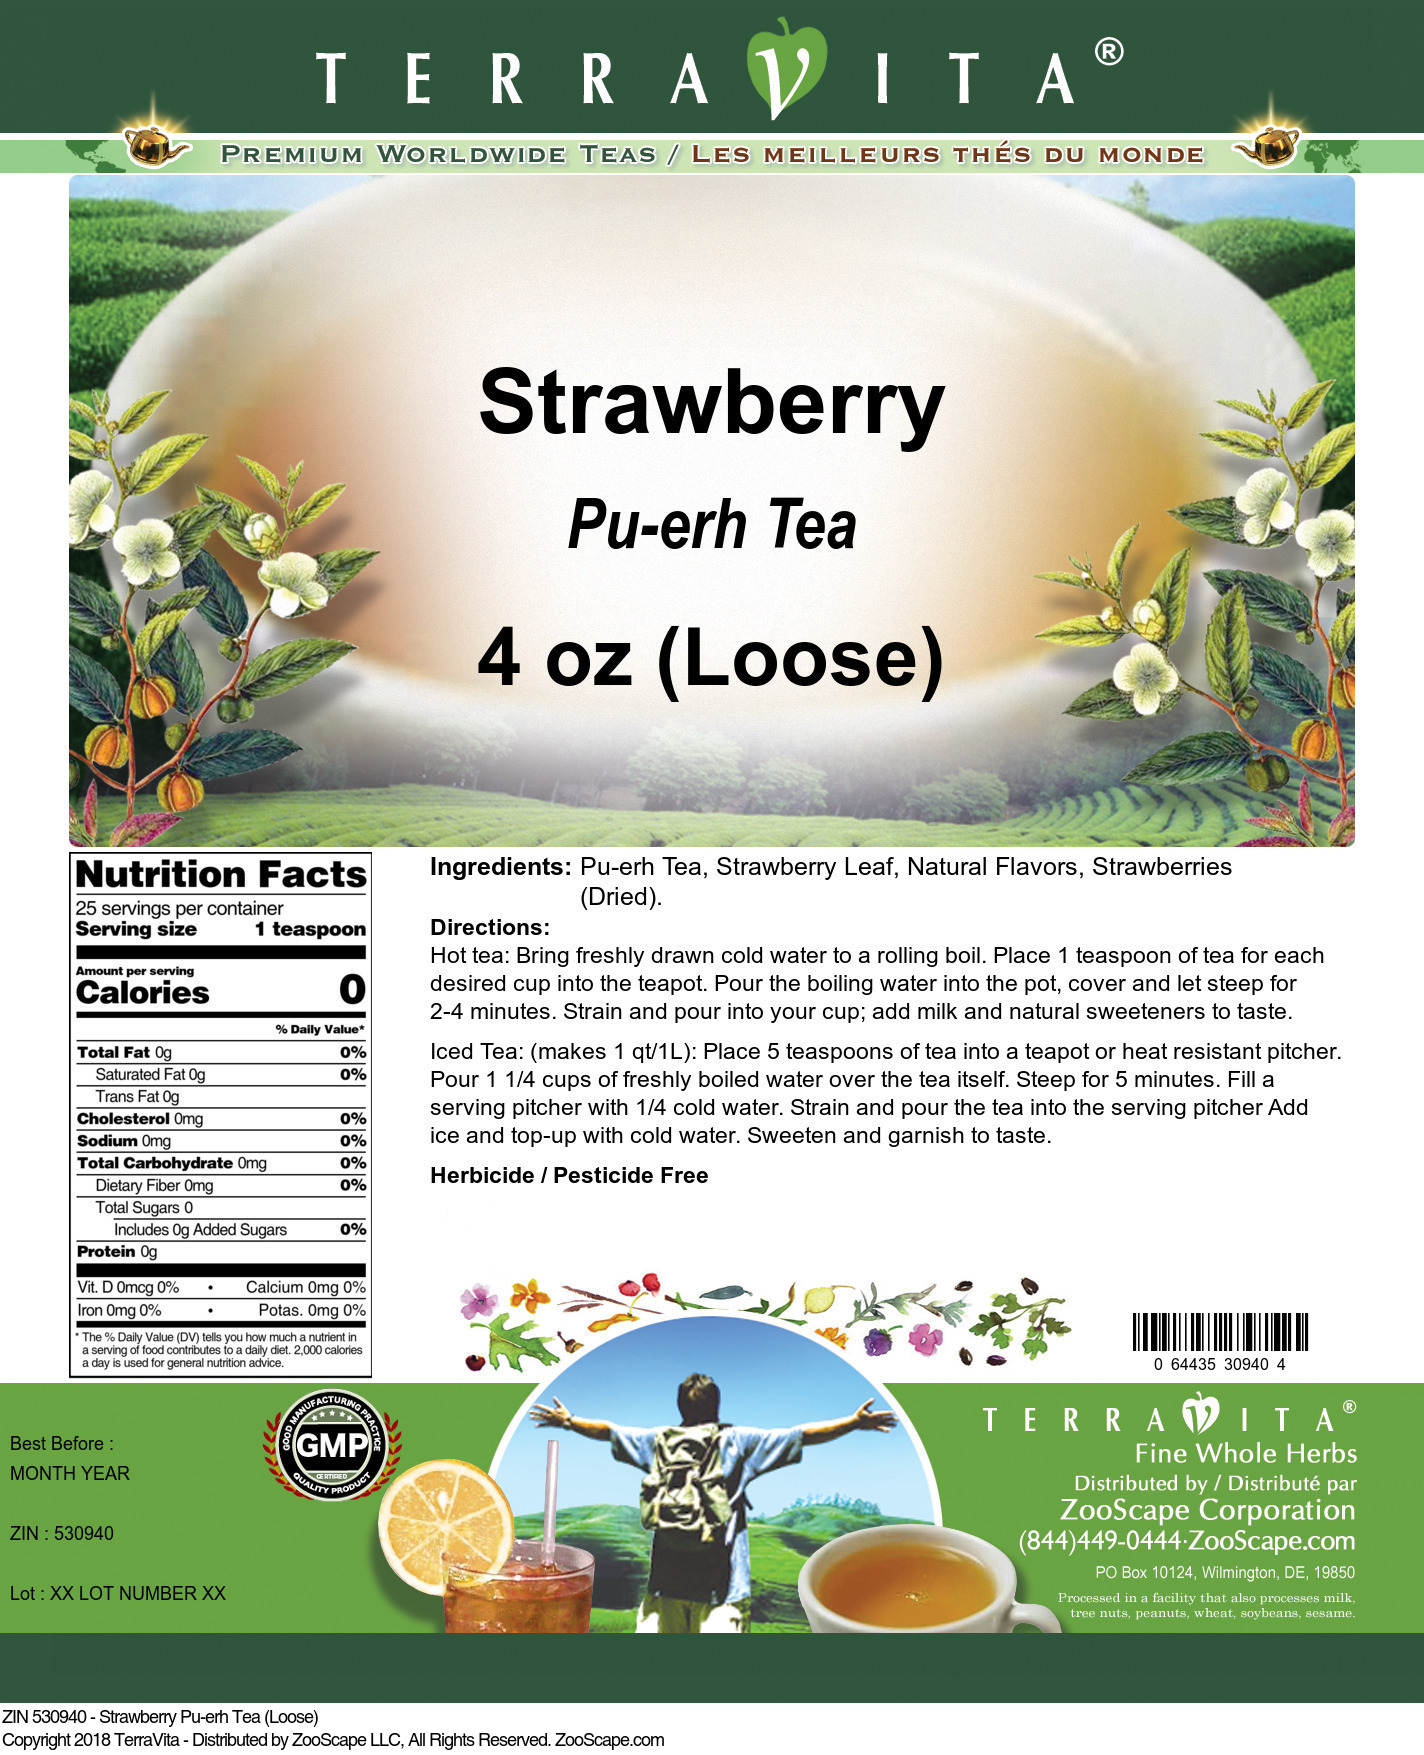 Strawberry Pu-erh Tea (Loose)